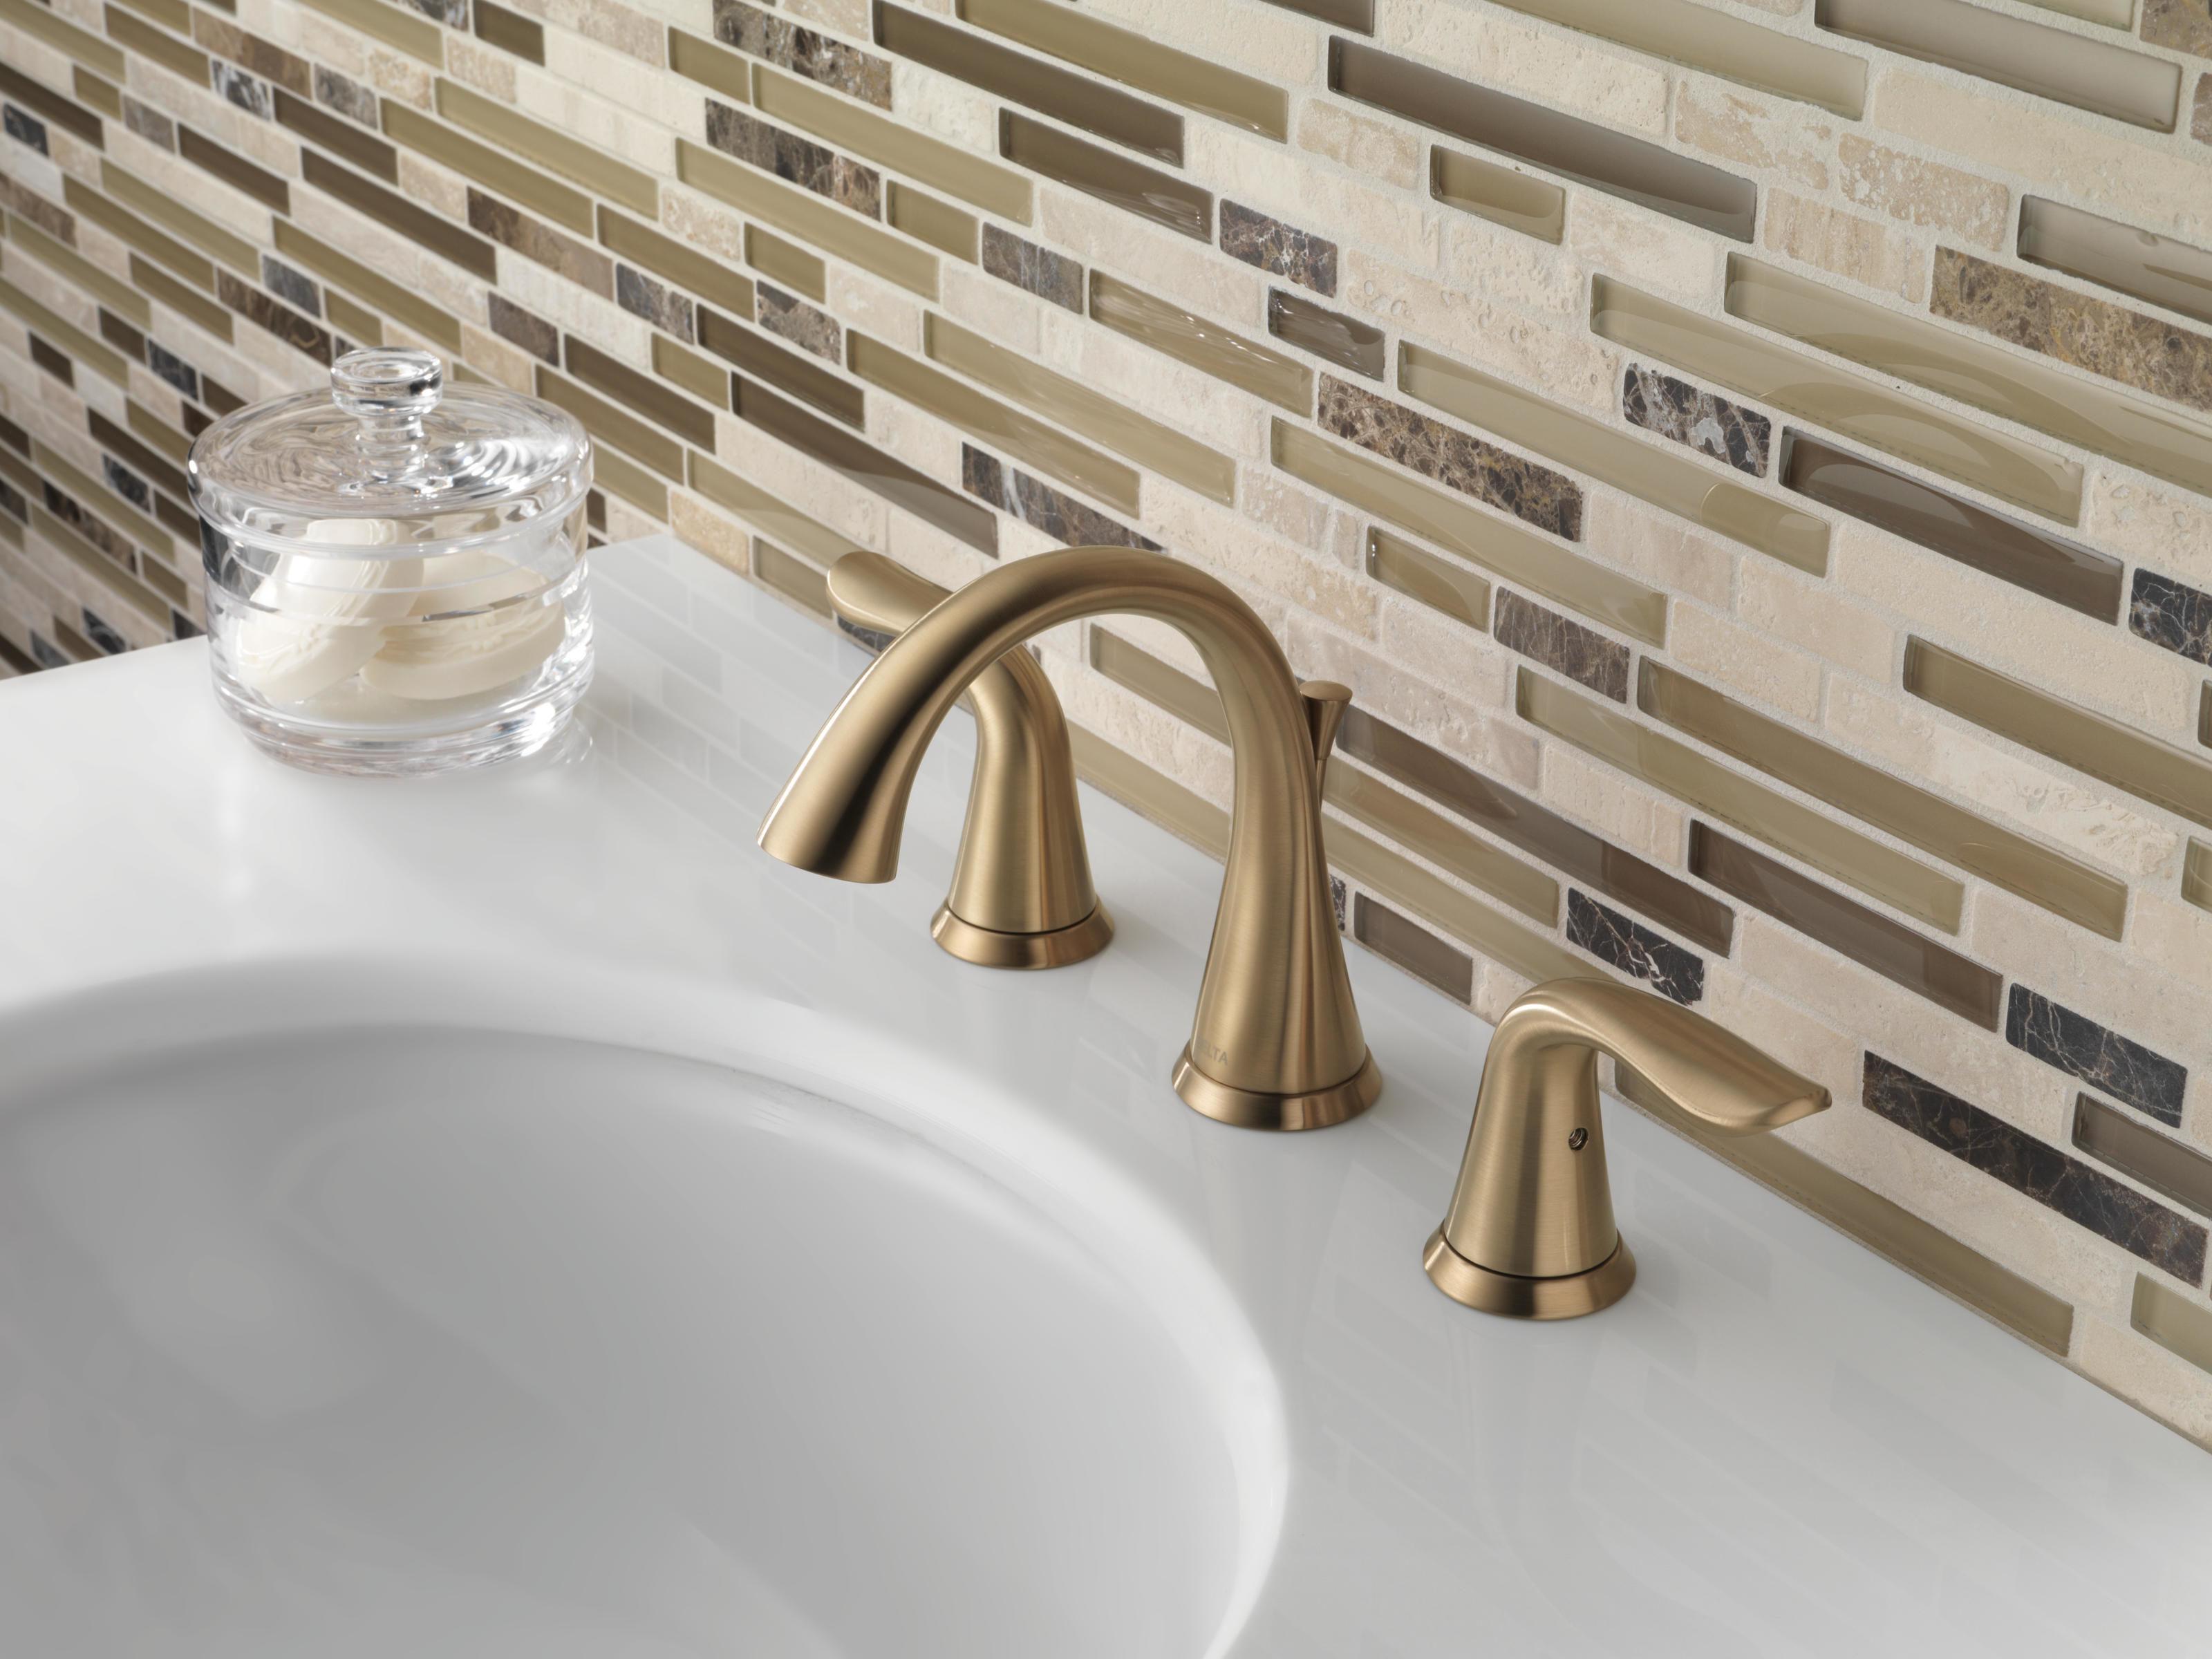 Champagne Bronze Bathroom Faucet. Delta 3538 Czmpu Dst Champagne Bronze Lahara Widespread Bathroom Faucet With Pop Up Drain Assembly Includes Lifetime Warranty Faucet Com